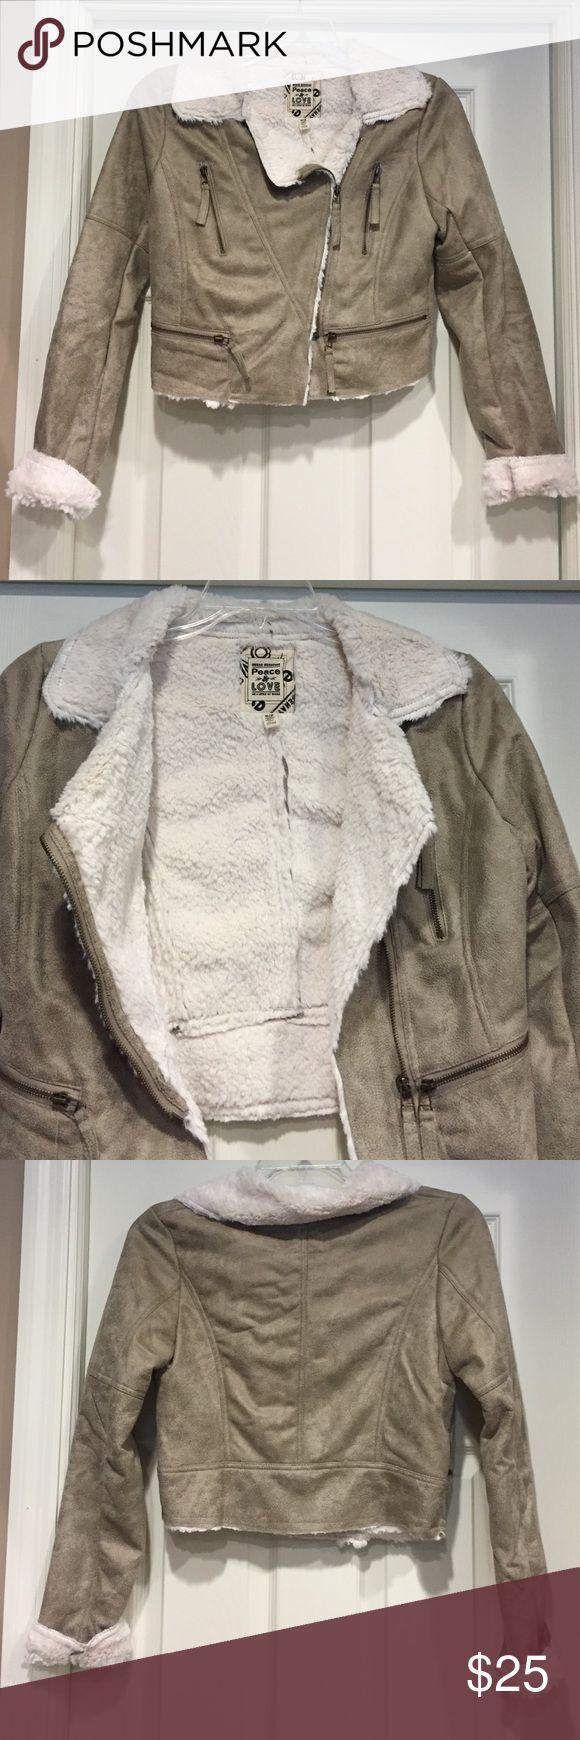 NWOT Urban Behavior Jacket Gorgeous ❤️❤️Perfect condition 🍁 Urban Behavior Jackets & Coats